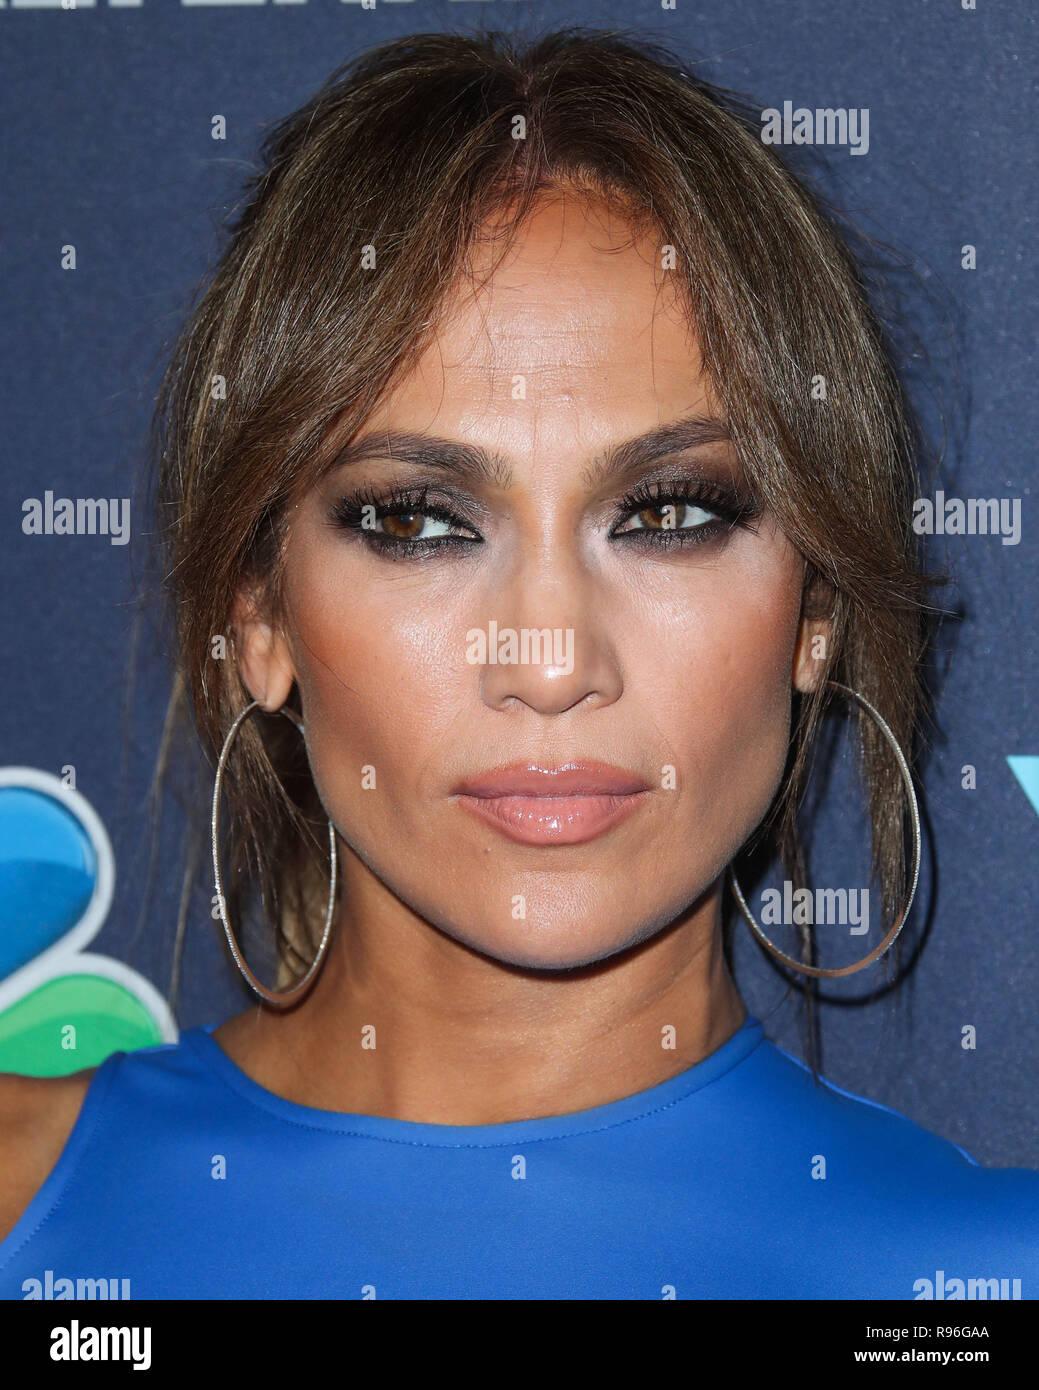 b6b887251998a WEST HOLLYWOOD, LOS ANGELES, CA, USA - SEPTEMBER 19: Singer Jennifer Lopez  wearing a David Koma dress and Giuseppe Zanotti shoes arrives at NBC's  'World Of ...